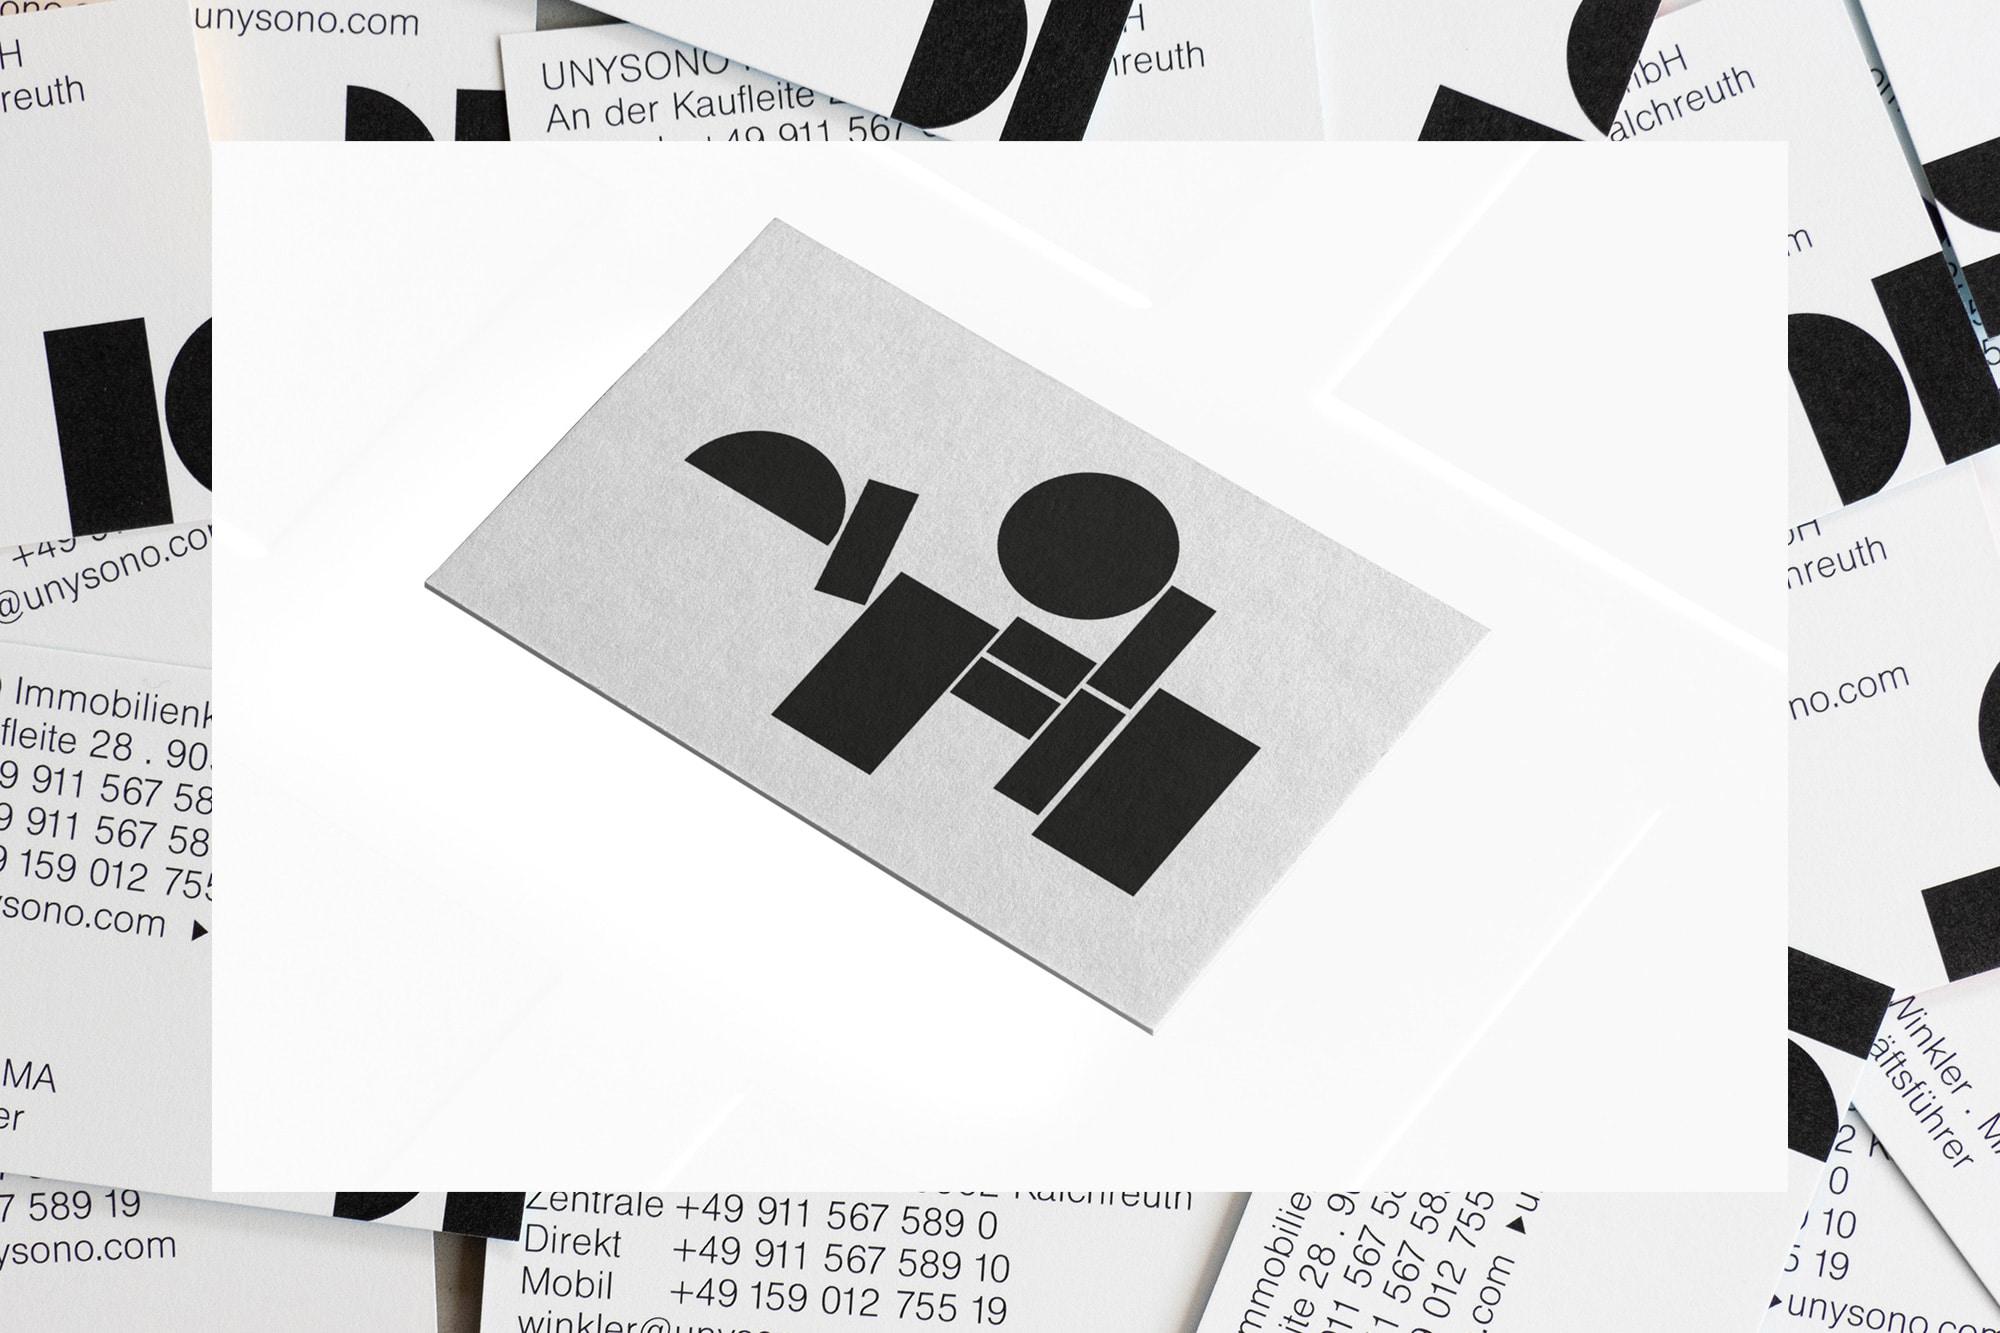 planx-UNYSONO-CorporateDesign-MOCK